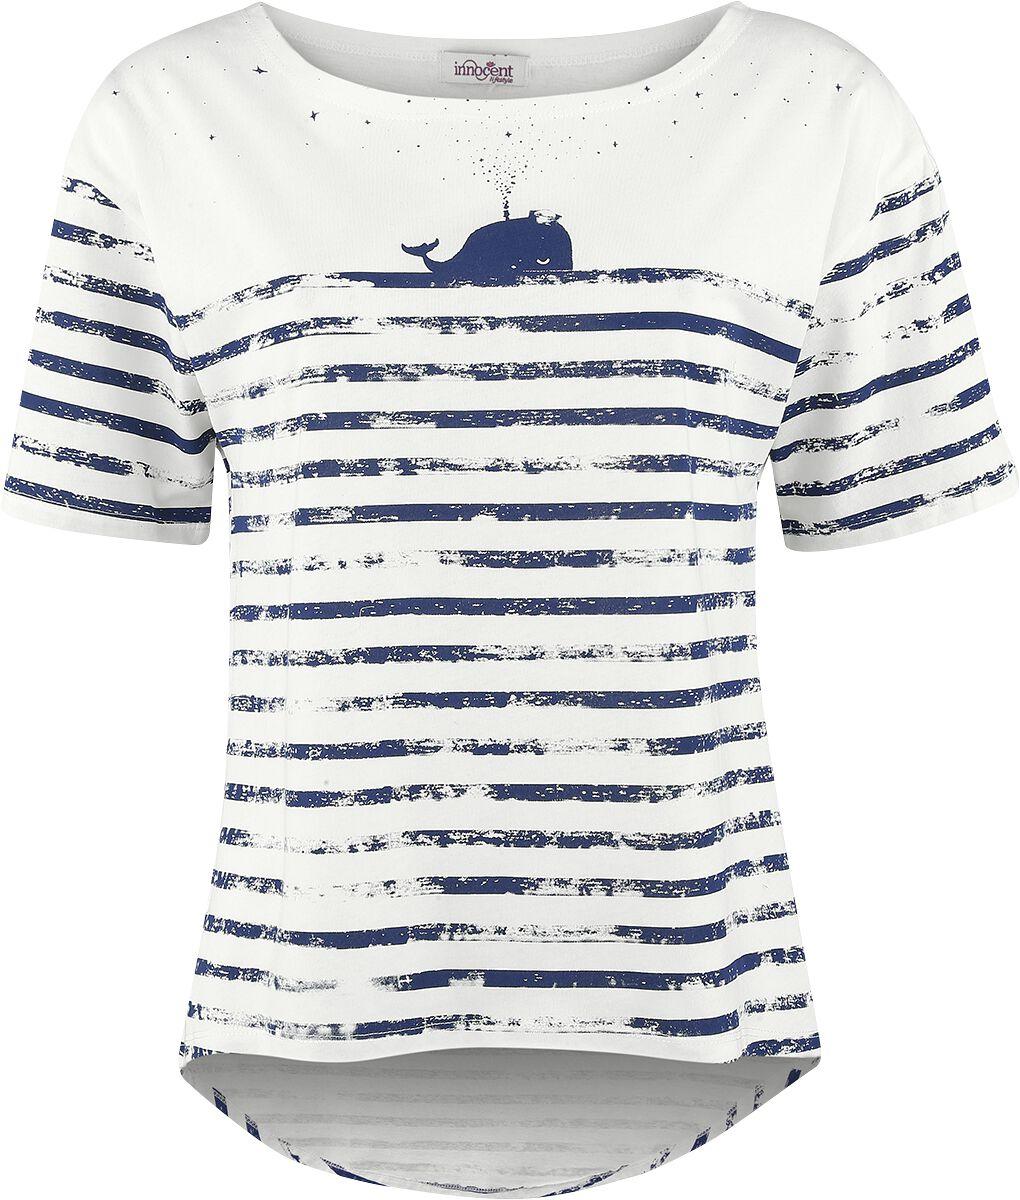 Marki - Koszulki - Koszulka damska Innocent Whale Lines Koszulka damska biały - 346240